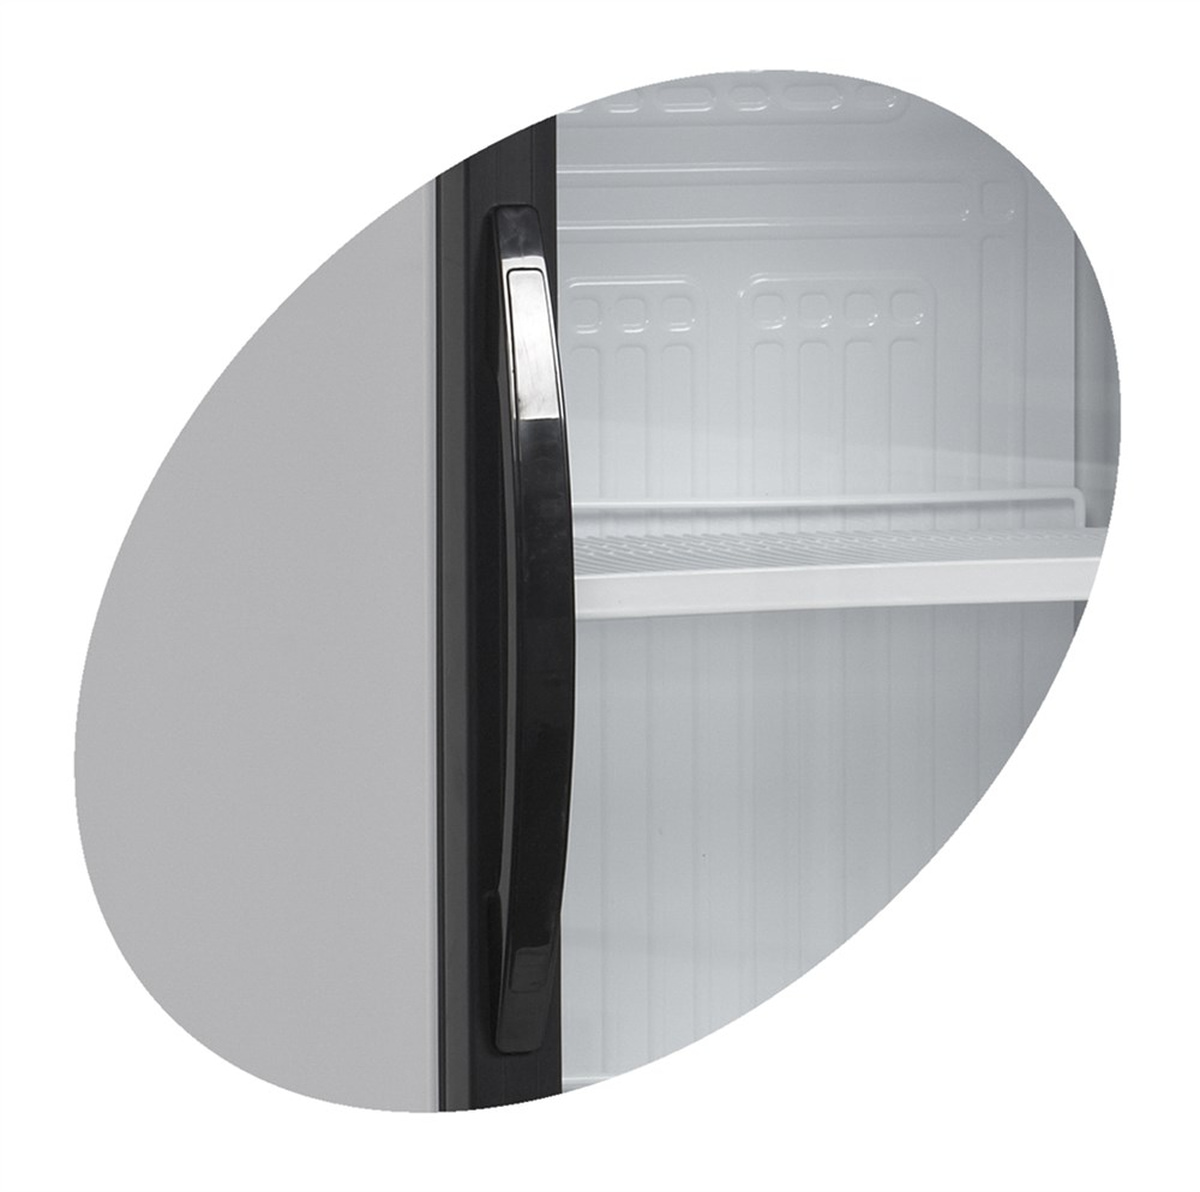 Tefcold display kjøleskap hvit 198 cmCEV425CP 2 LED